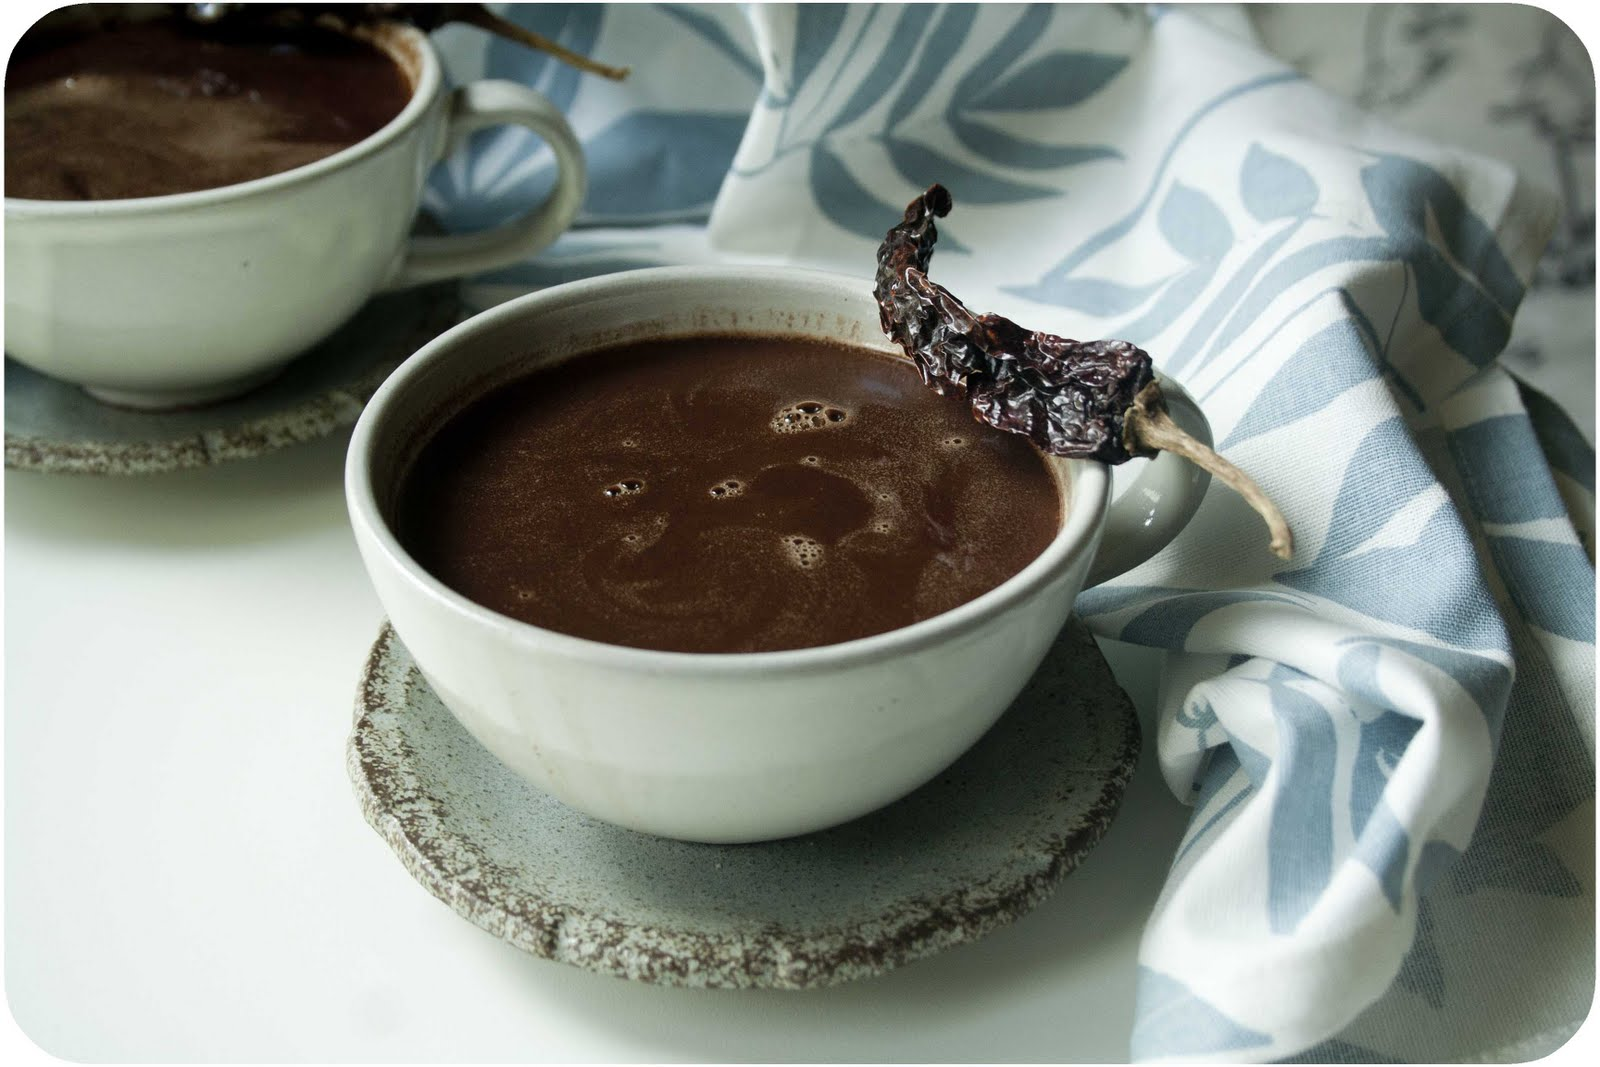 Chocolate, Chocolate & More Chocloate